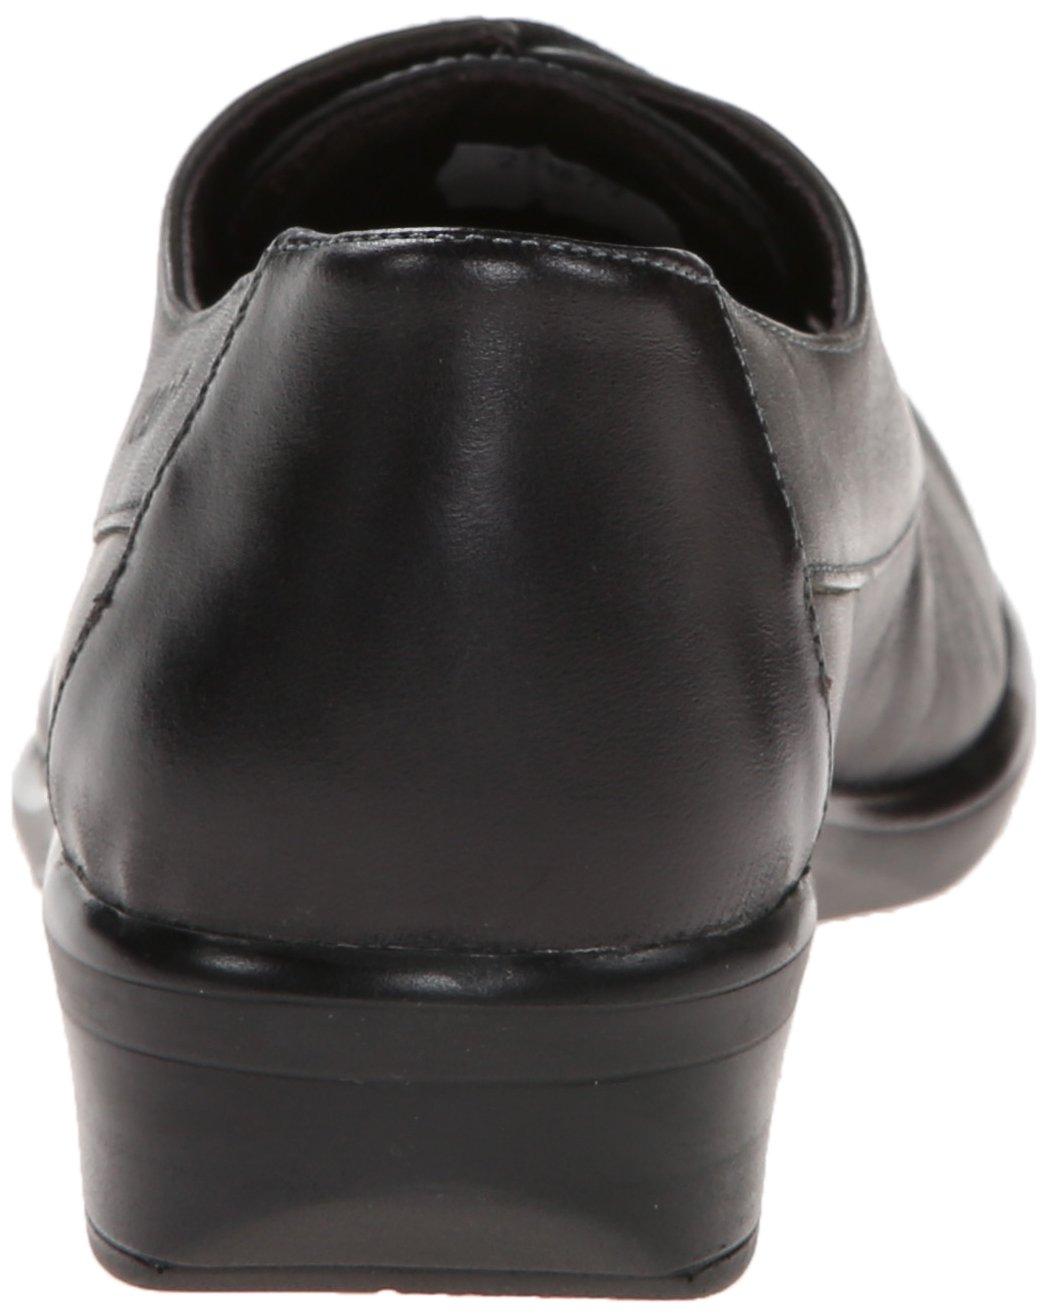 NAOT Women's Kedma Oxford B0072KY2NW 41 EU/10-10.5 M US Jet Black Leather/Tin Gray Leather